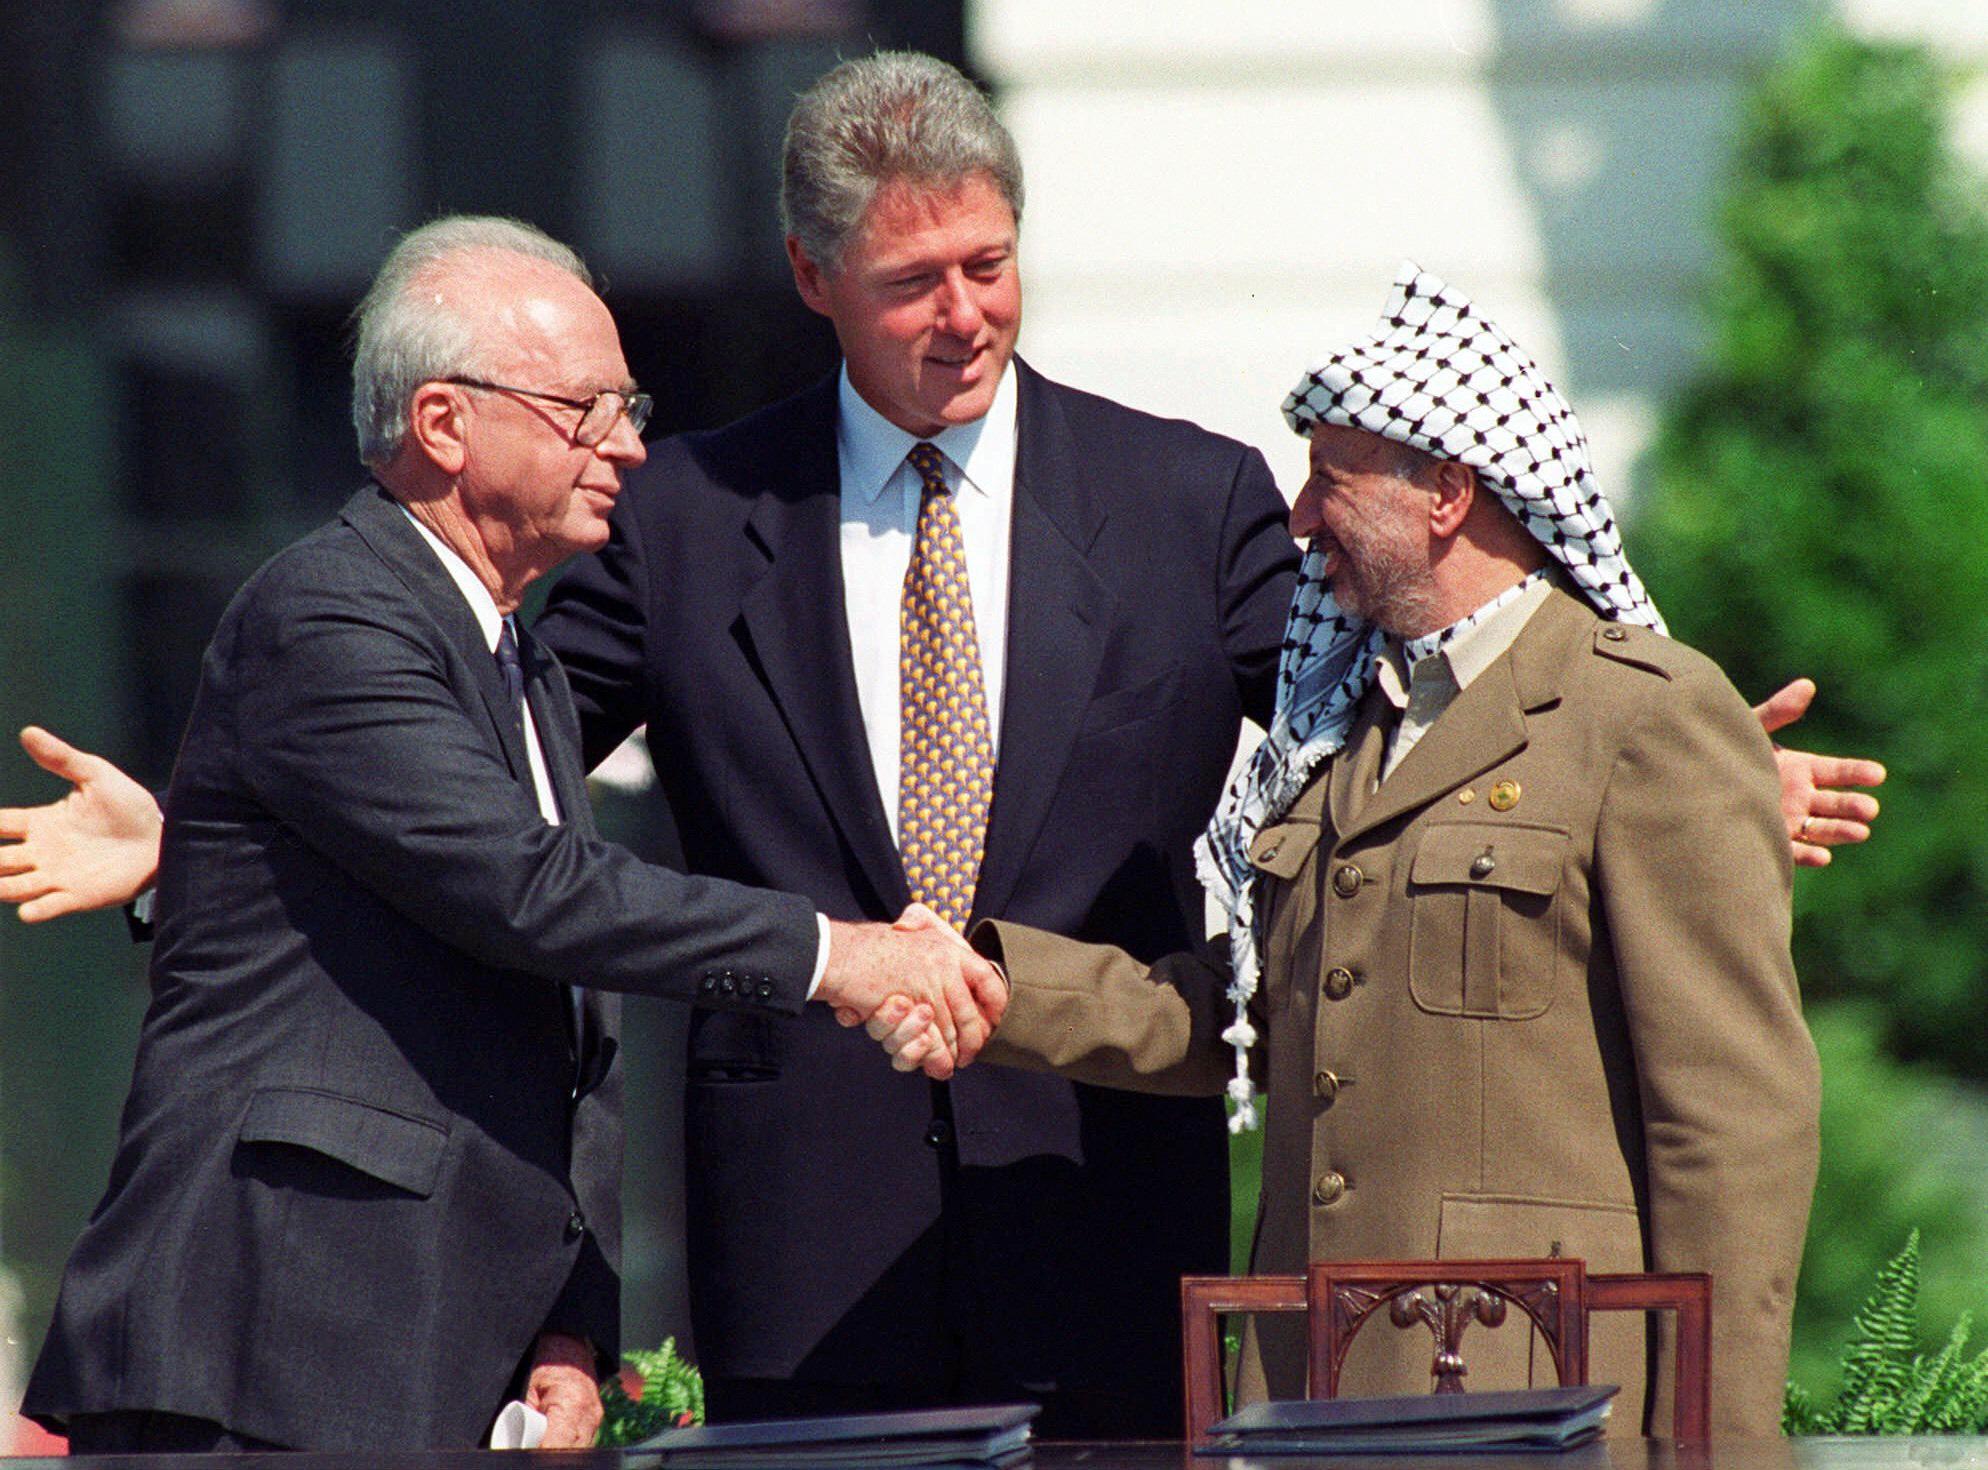 Oslo Accords handshake